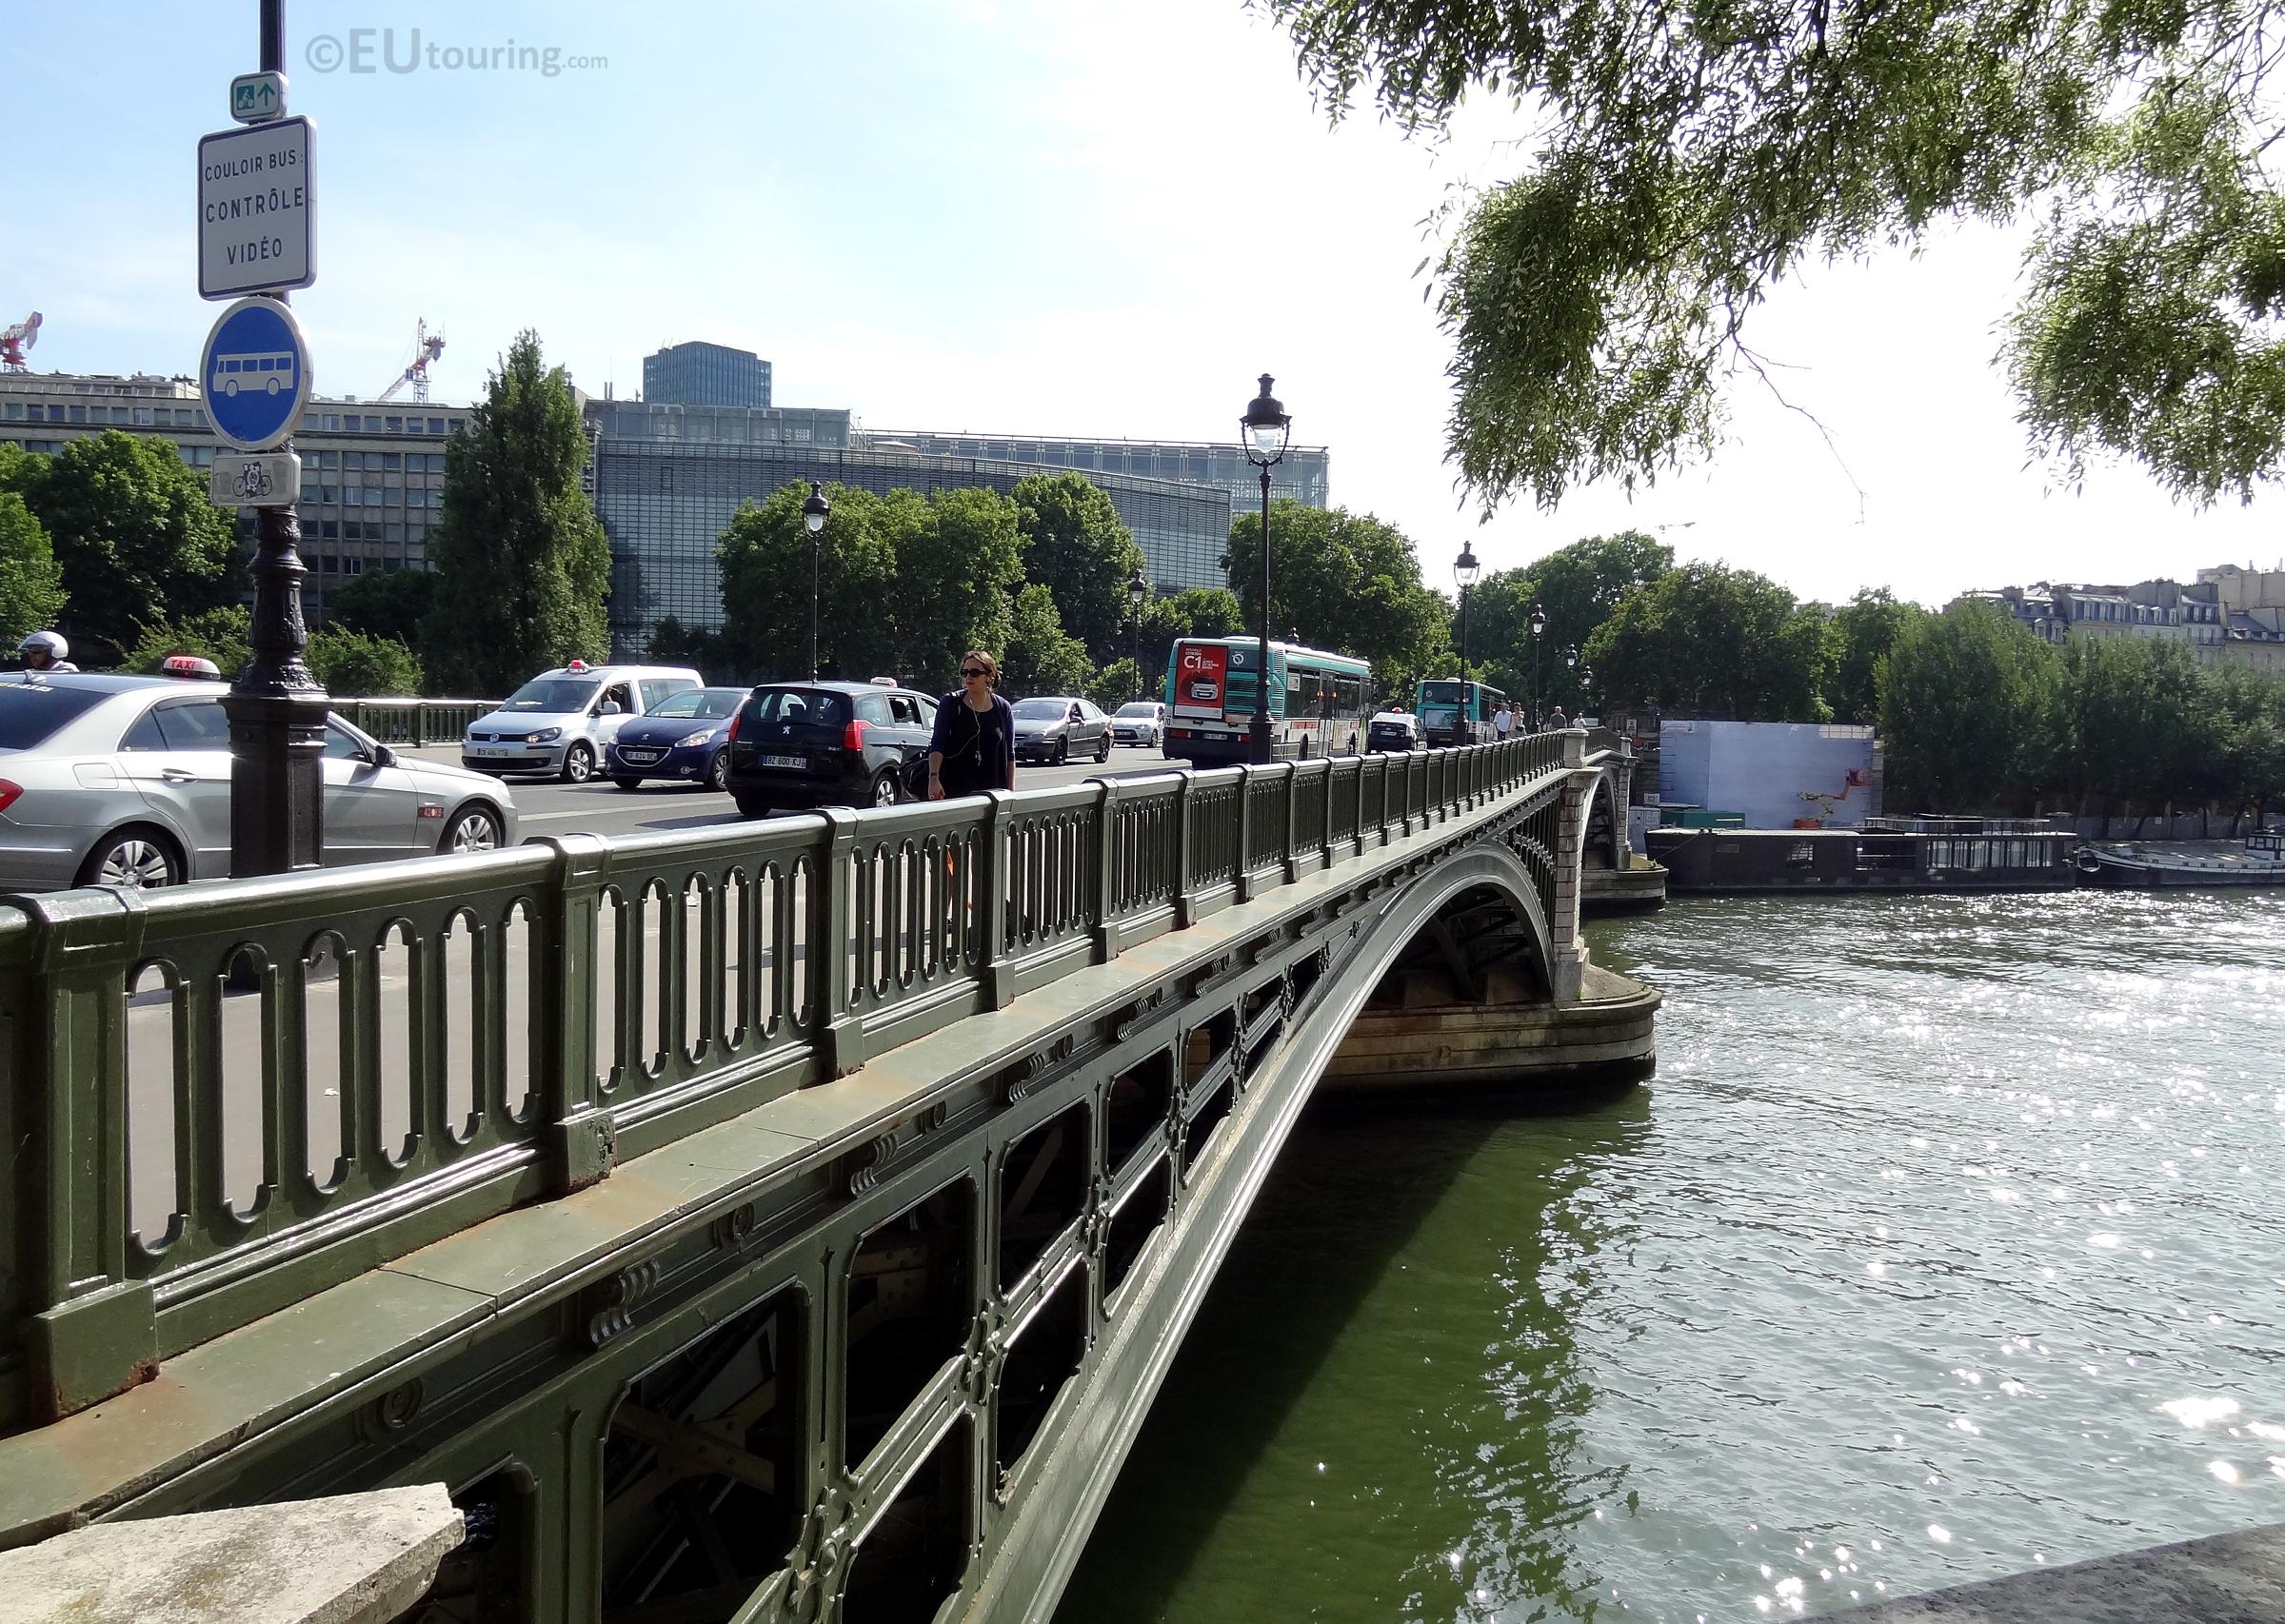 Iron railing of the bridge